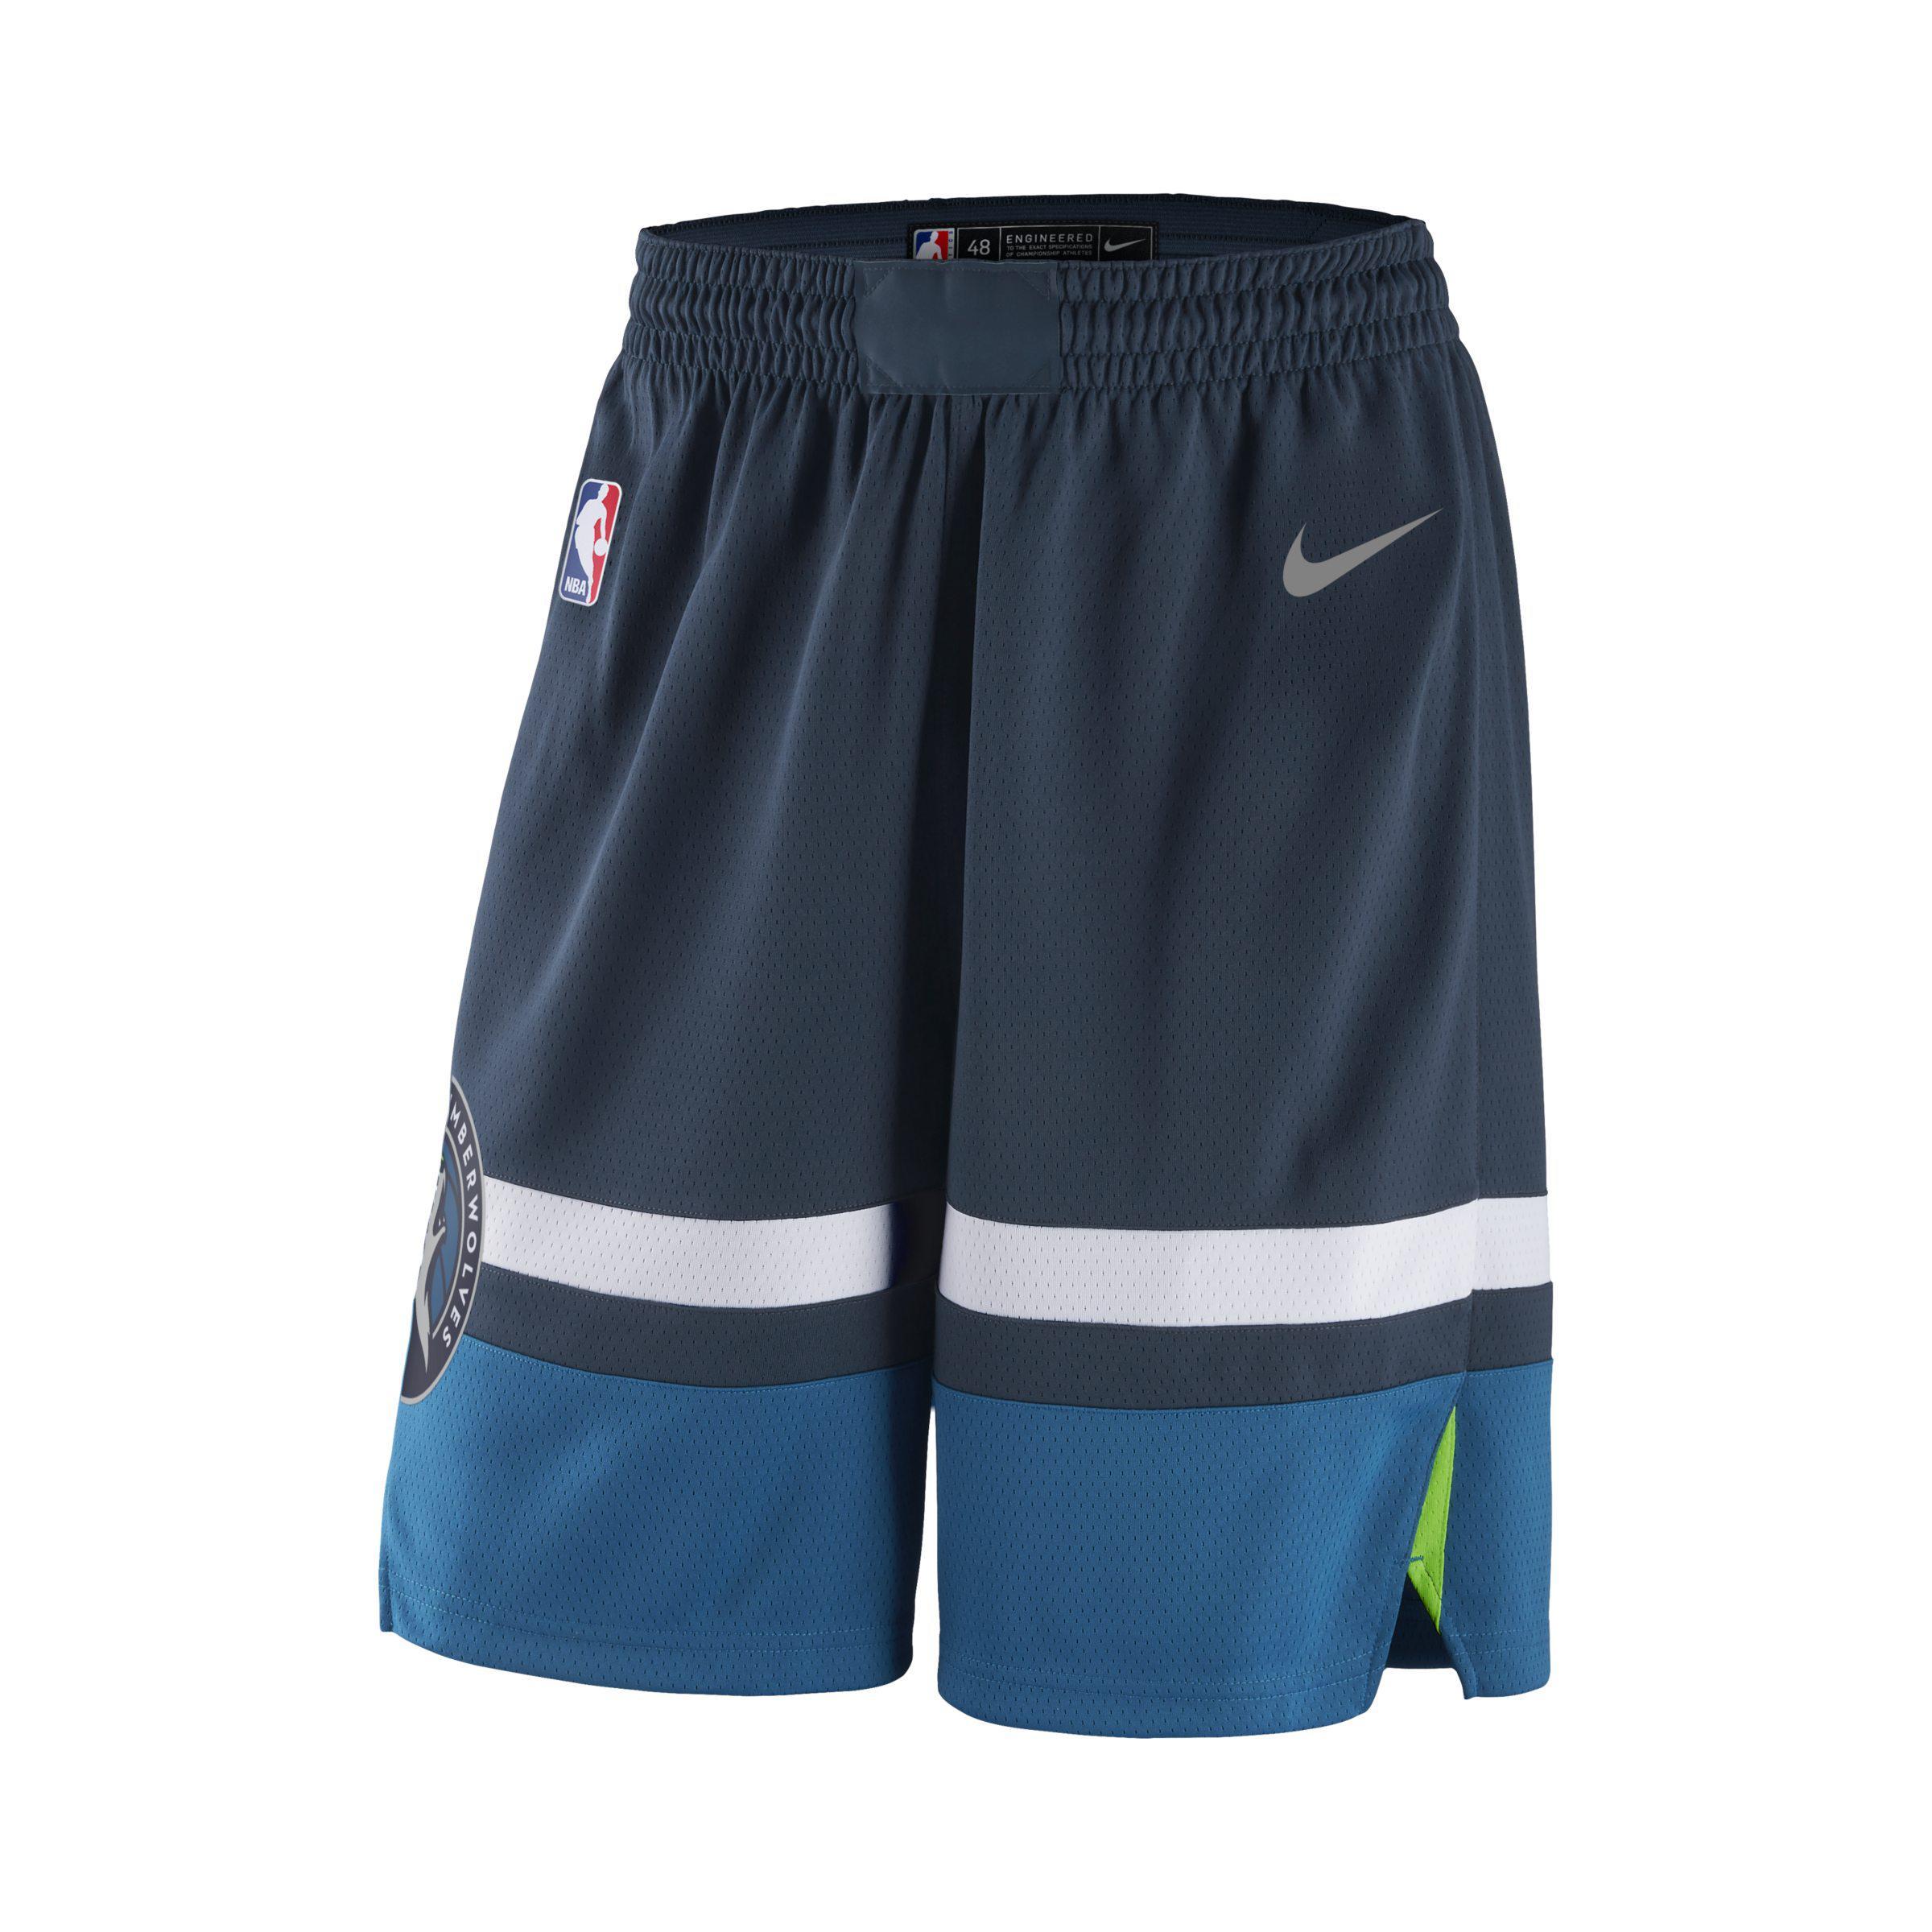 8850358d7d9 Nike Minnesota Timberwolves Icon Edition Swingman Nba Shorts in Blue ...